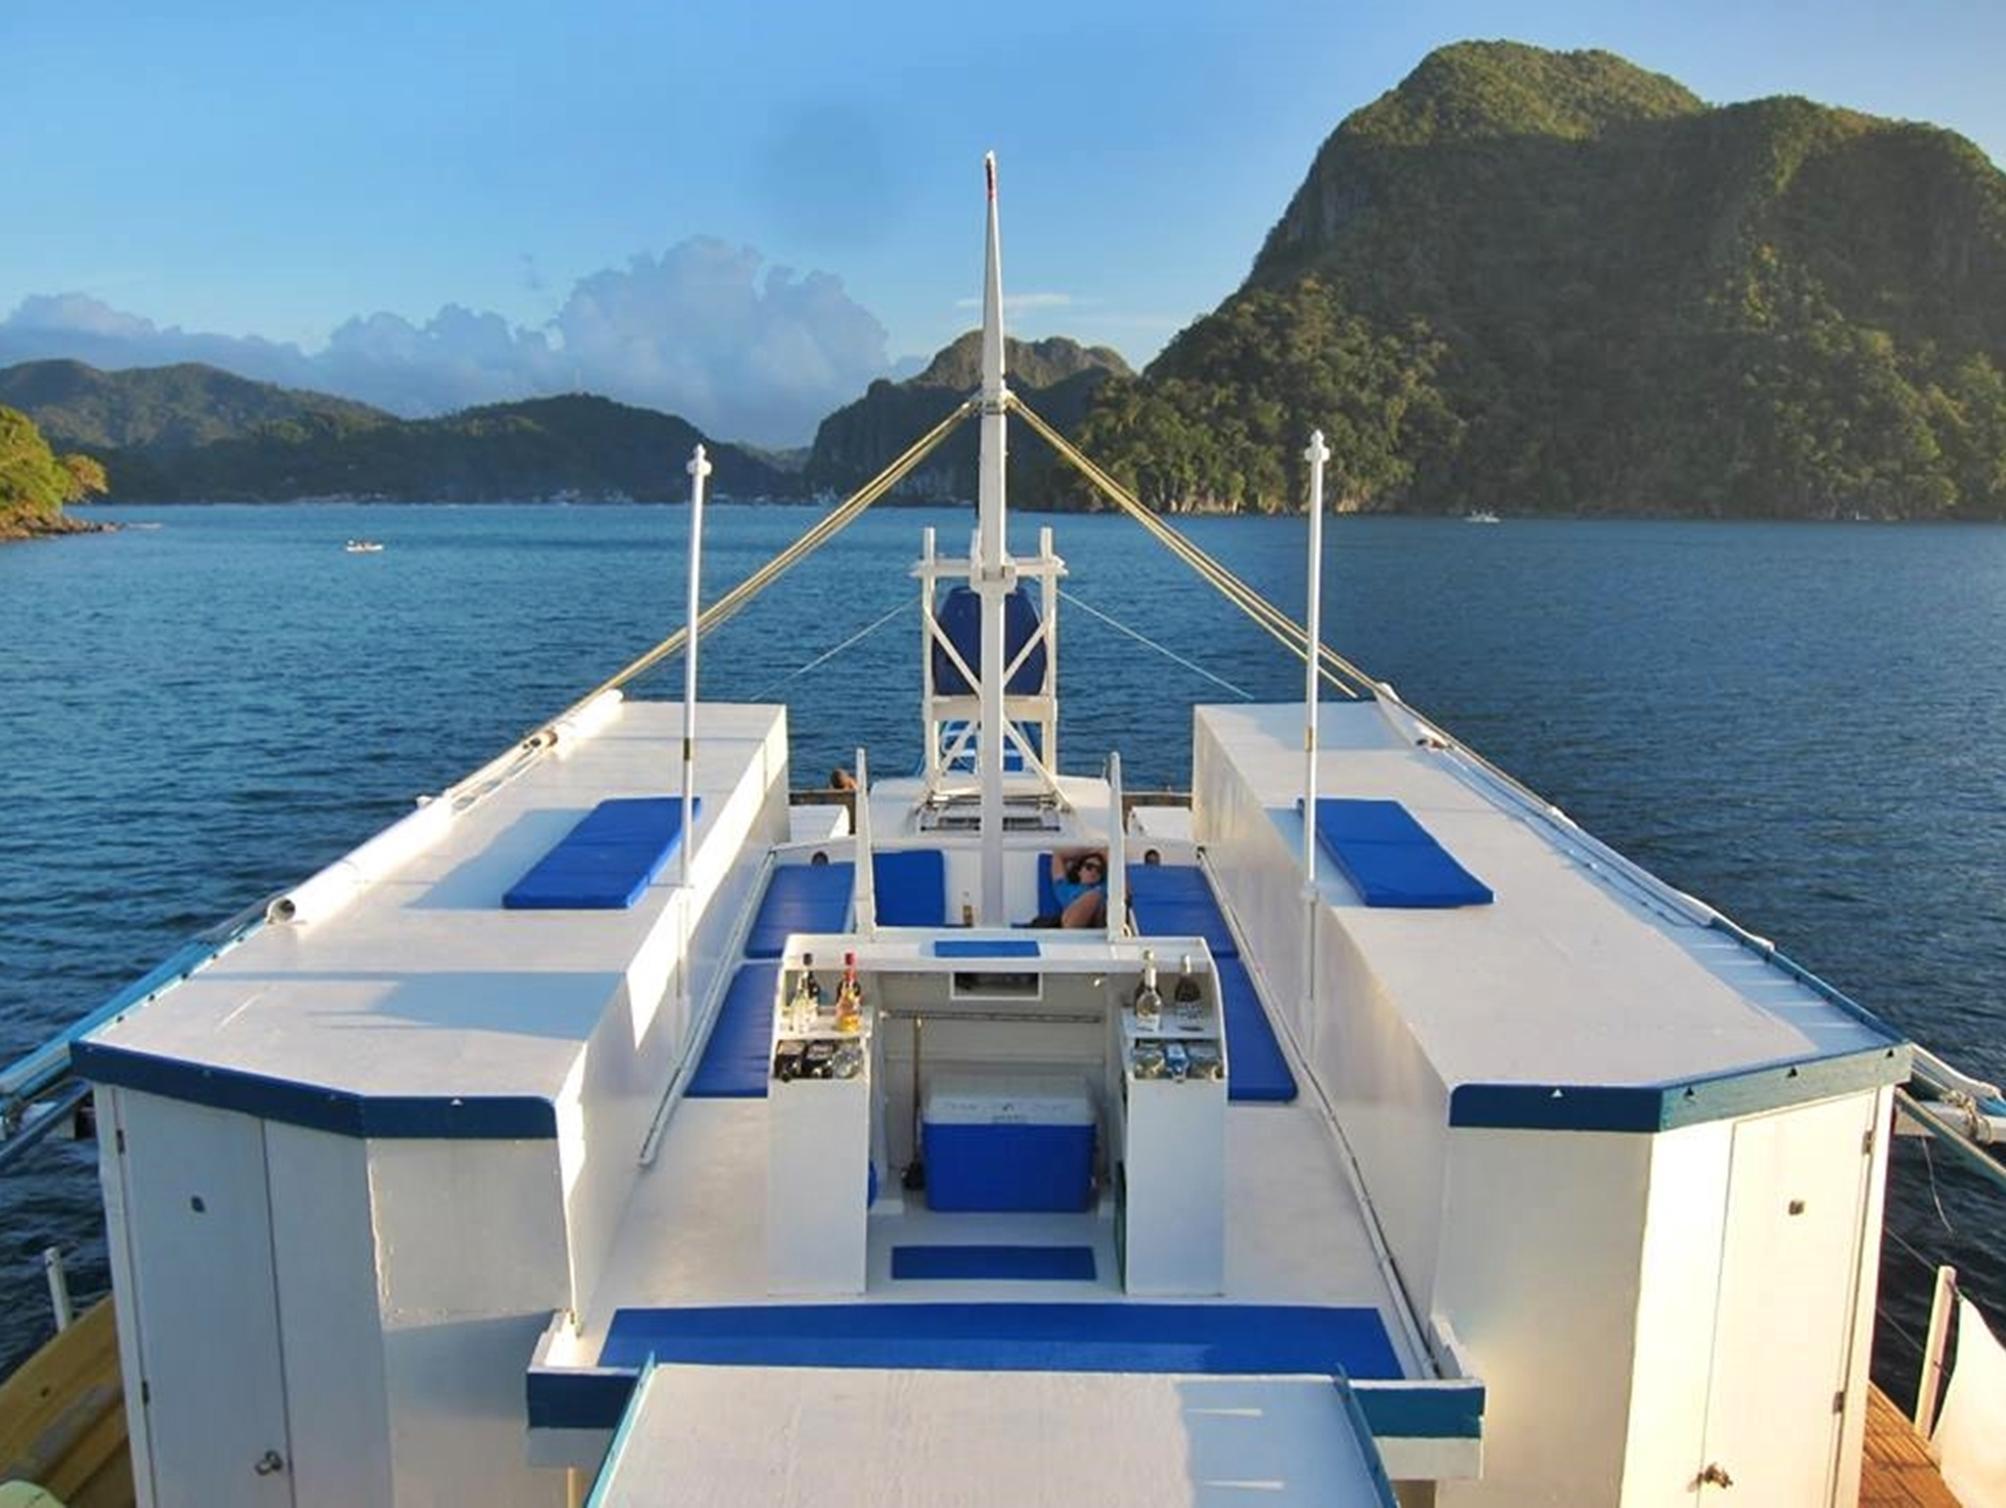 Palawan Secret Cruise Floating Hotel Deals